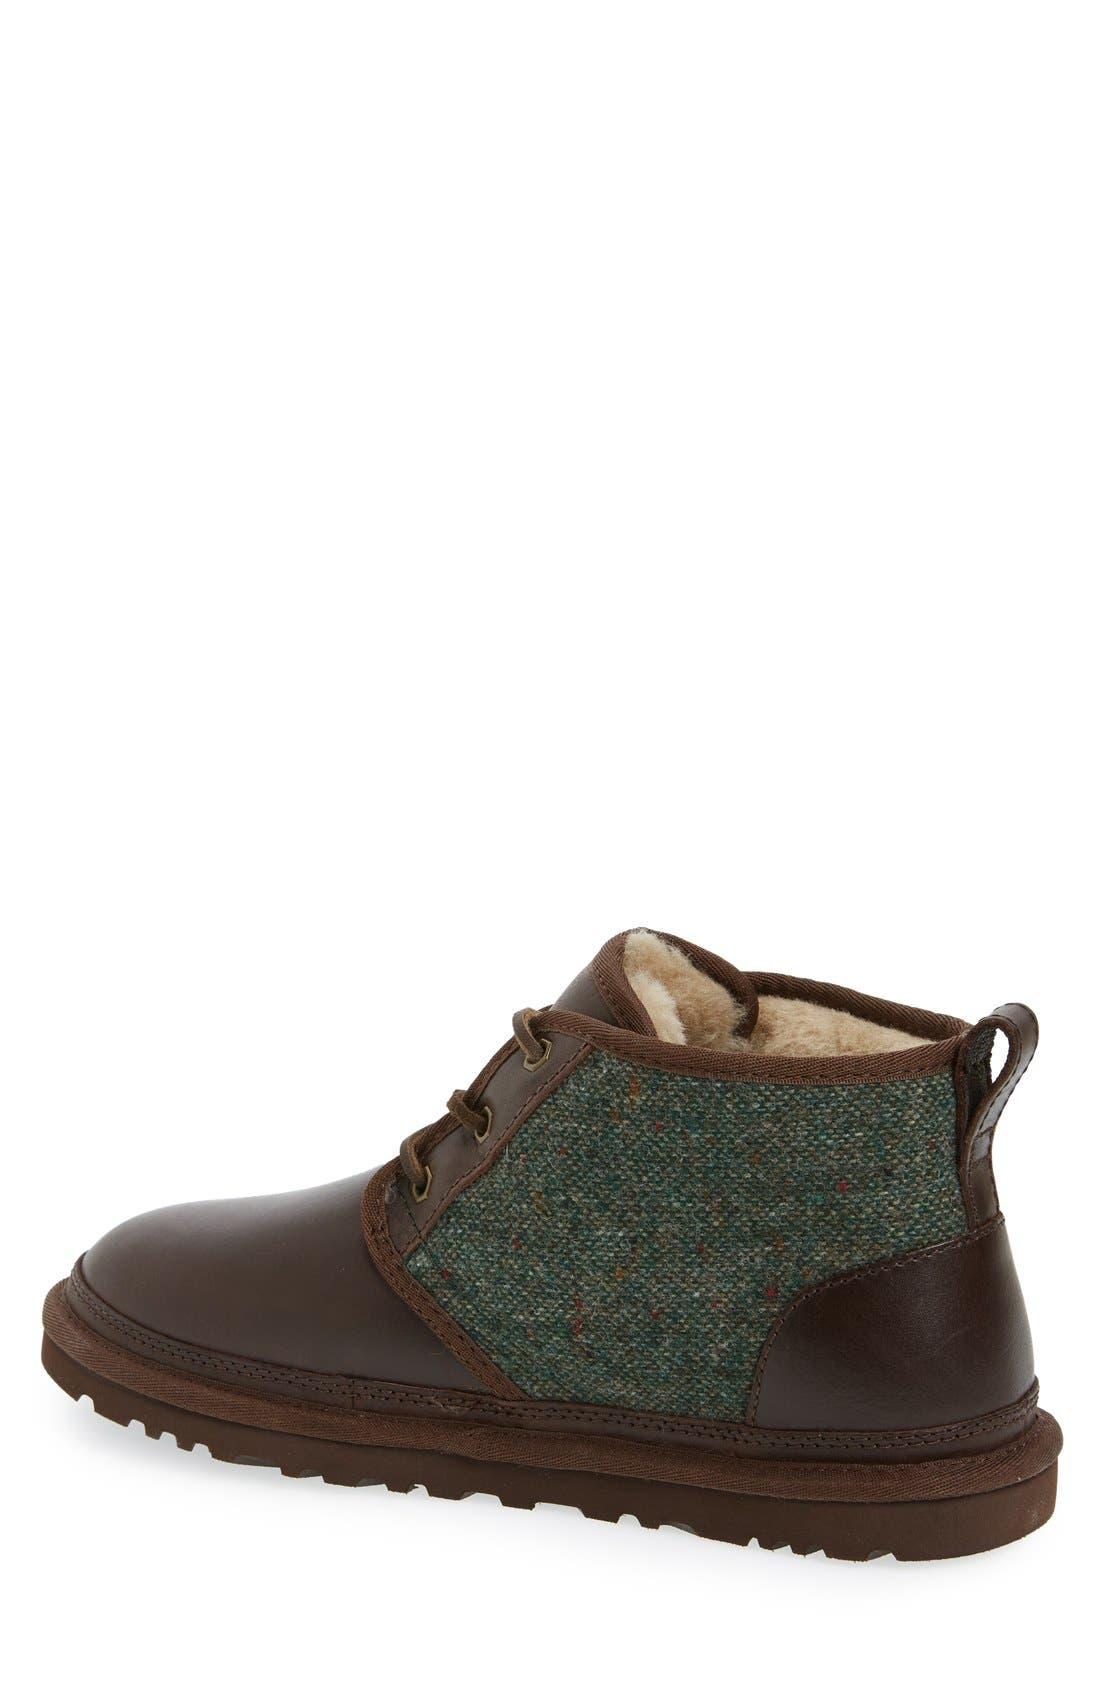 Neumel Wool & Leather Chukka Boot,                             Alternate thumbnail 2, color,                             207